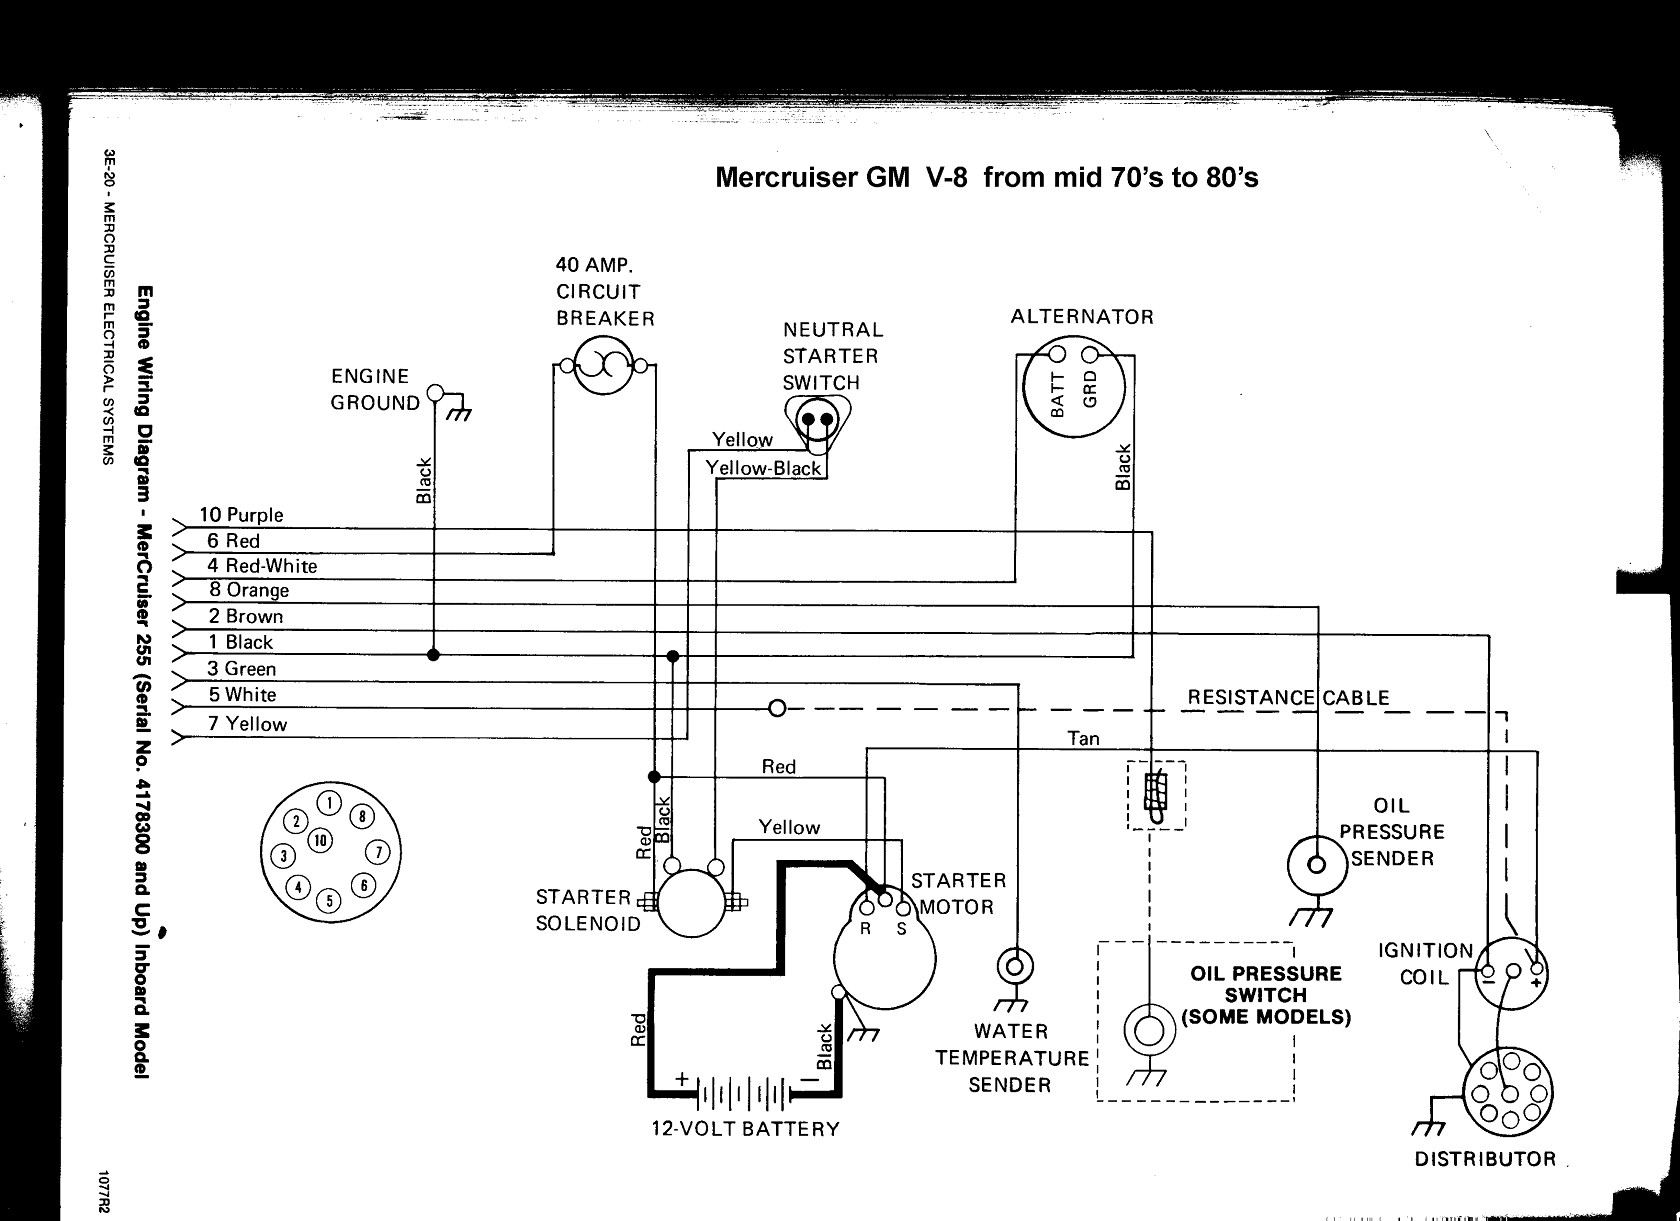 hight resolution of mercruiser 4 3 wiring diagram old fashioned 454 mercruiser wiring diagram ponent electrical 3 0 l